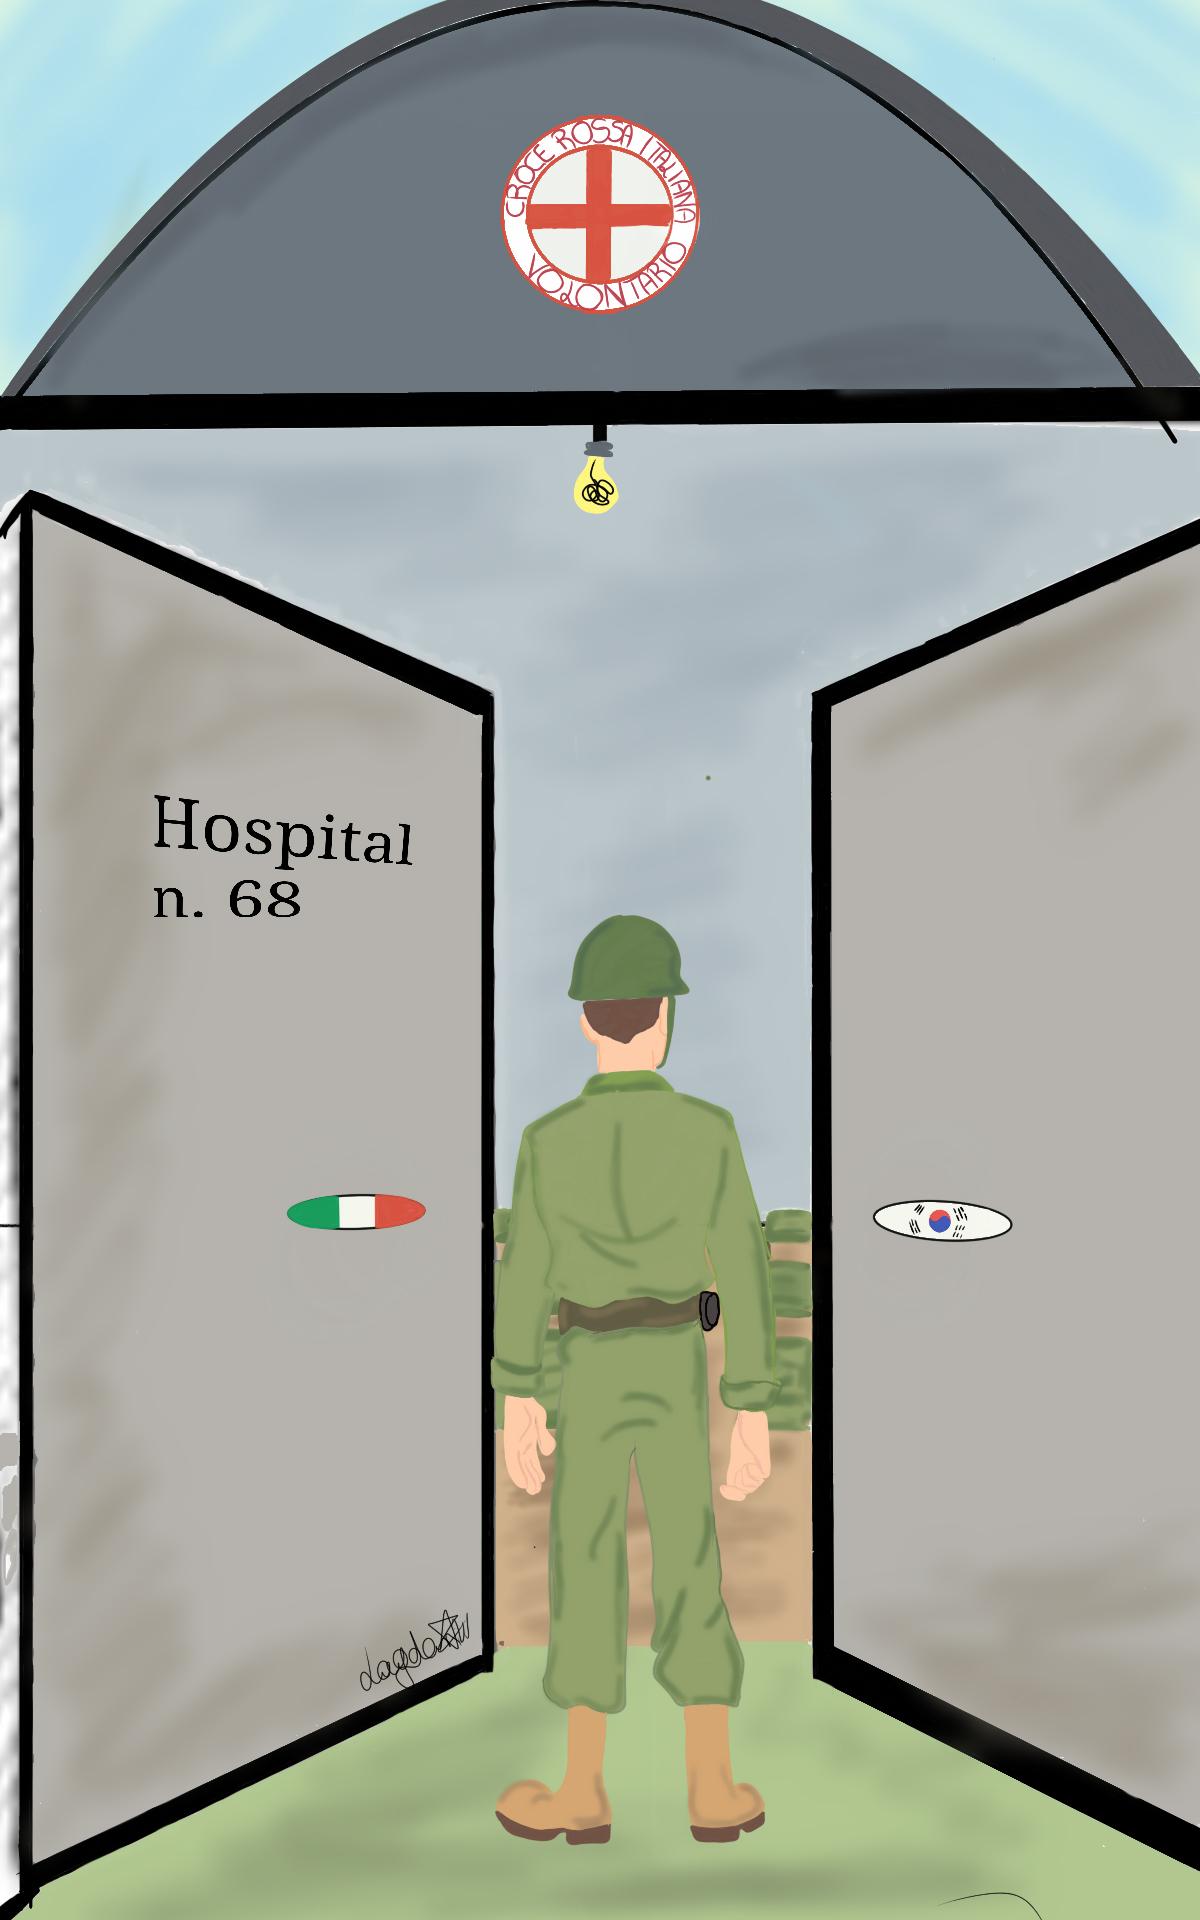 Italian\'s illustrations mark 70th anniversary of Korean War\'s outbreak